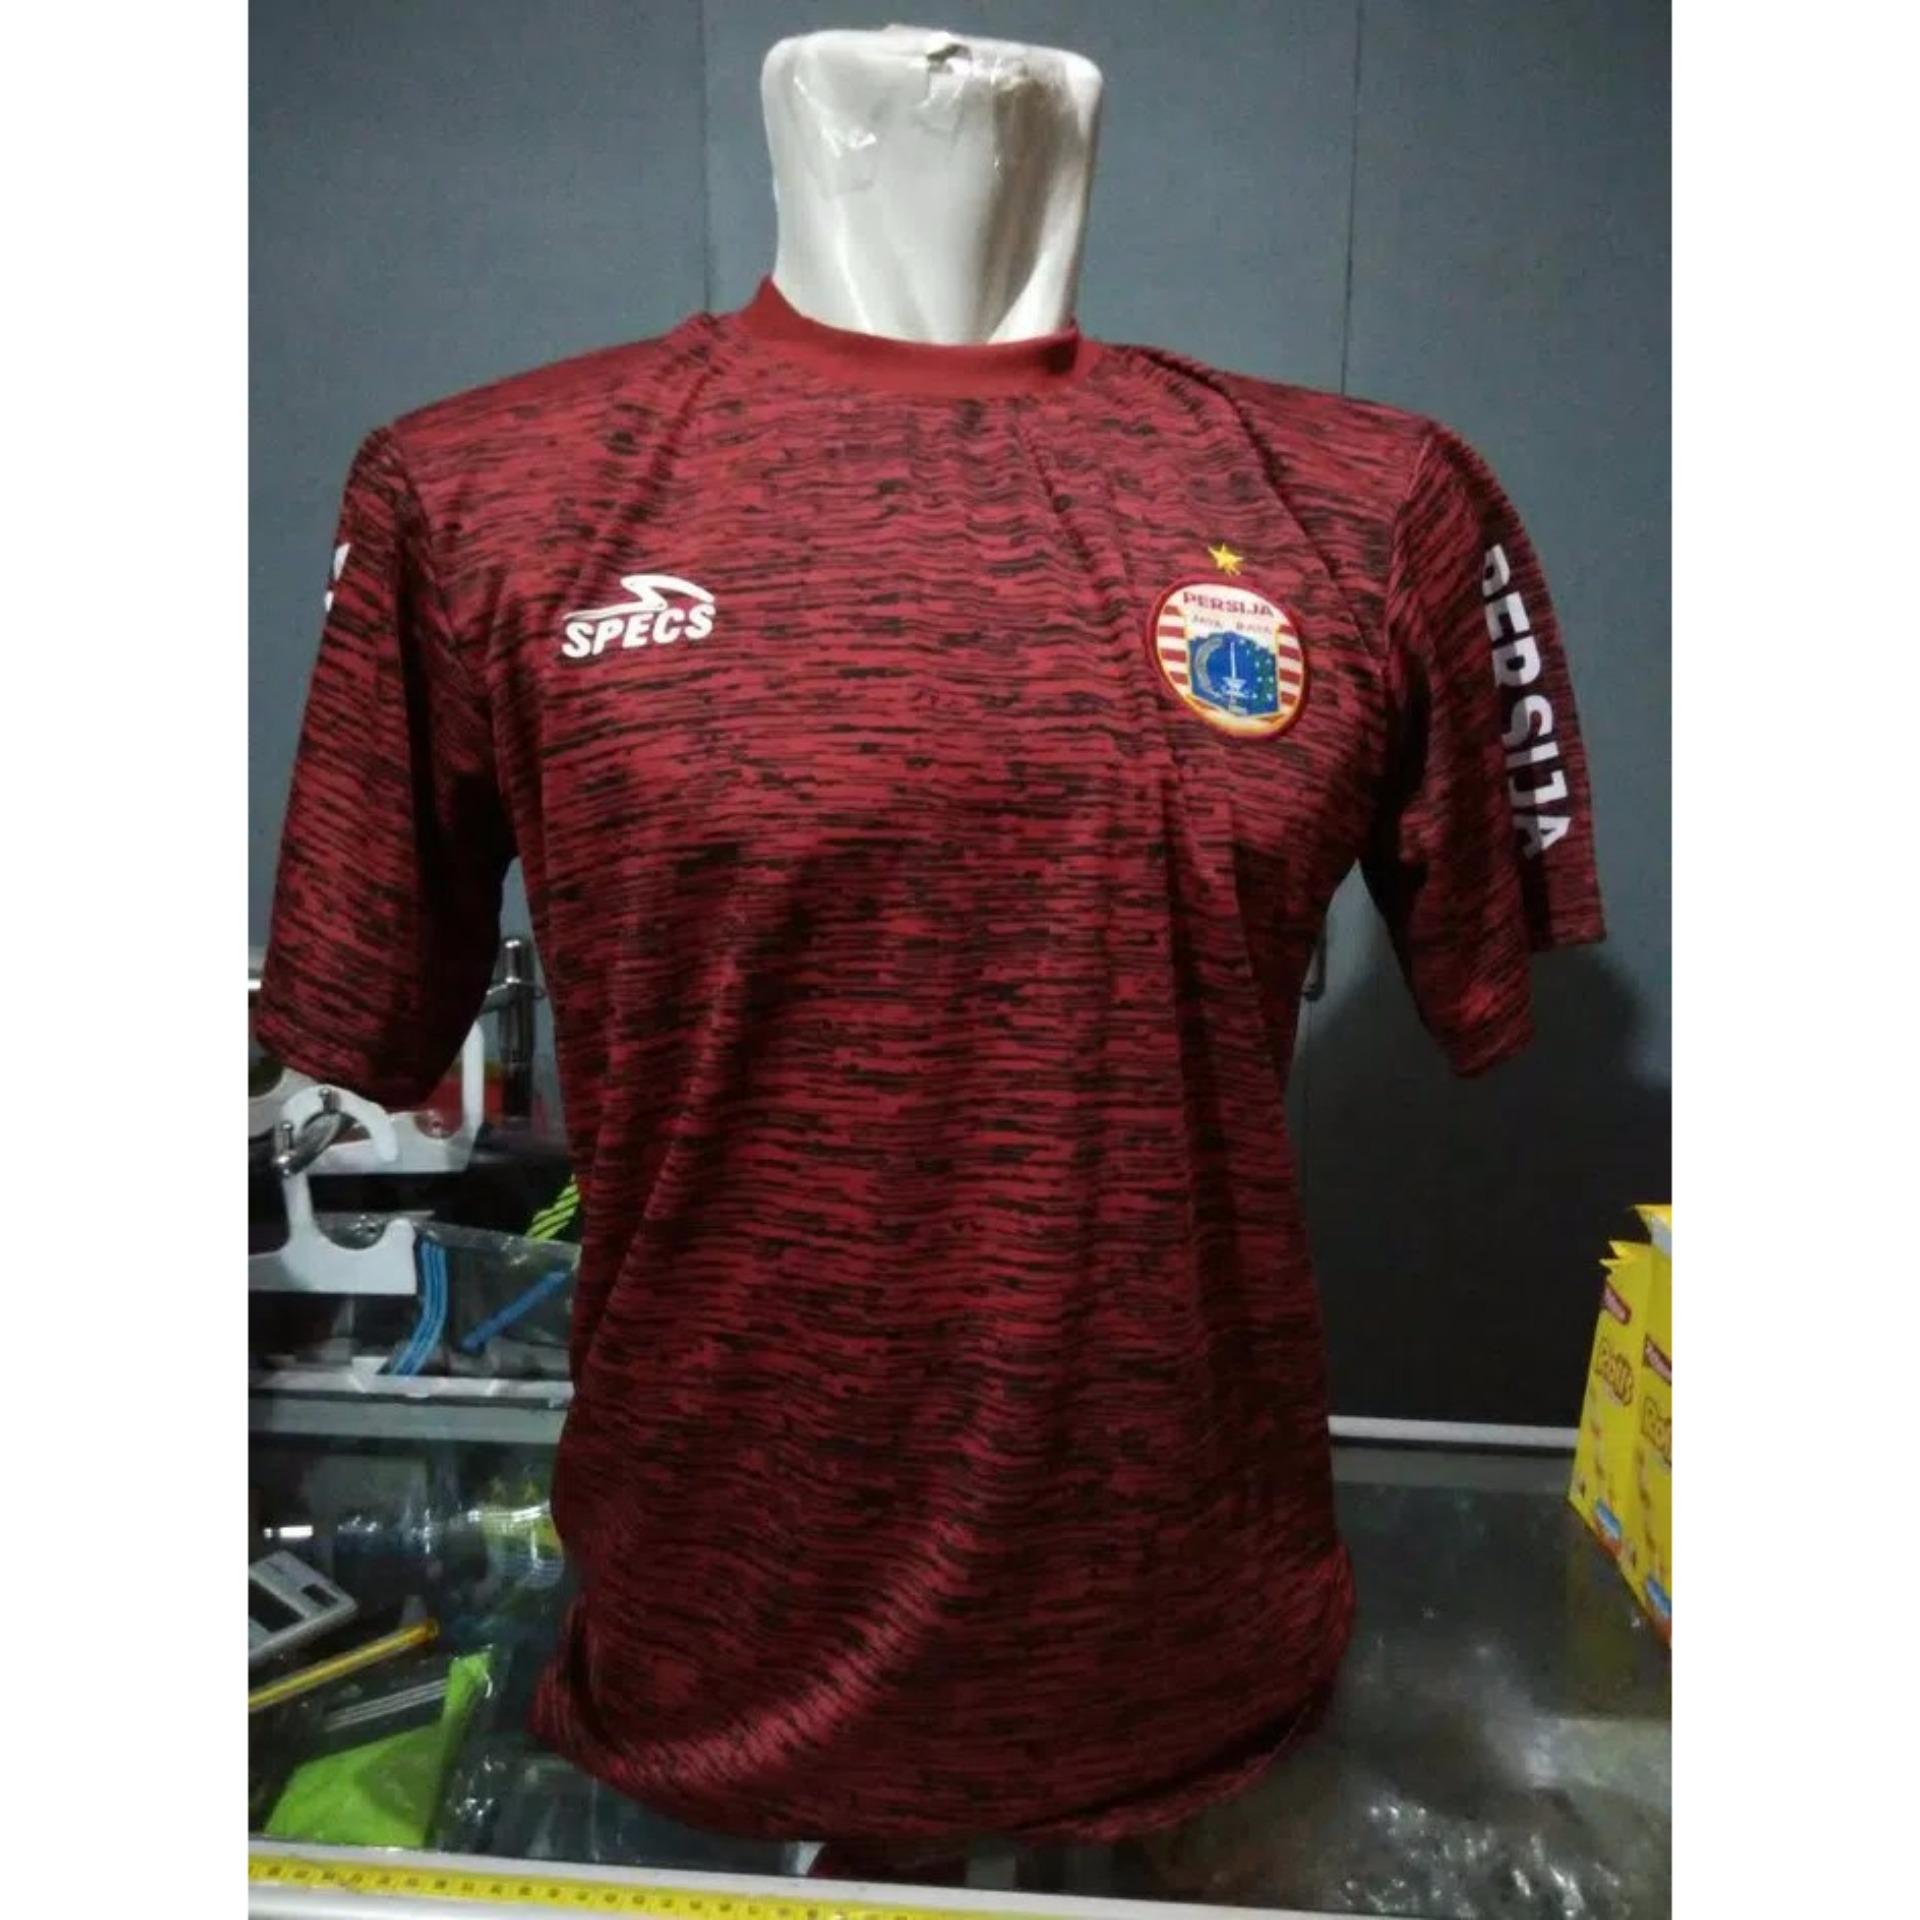 Kaos Murah Tshirt Distro Club Bola Indonesia Persija Jakarta Fc T Shirt 1928 Tulisan Arab Jersey Latihan 2018